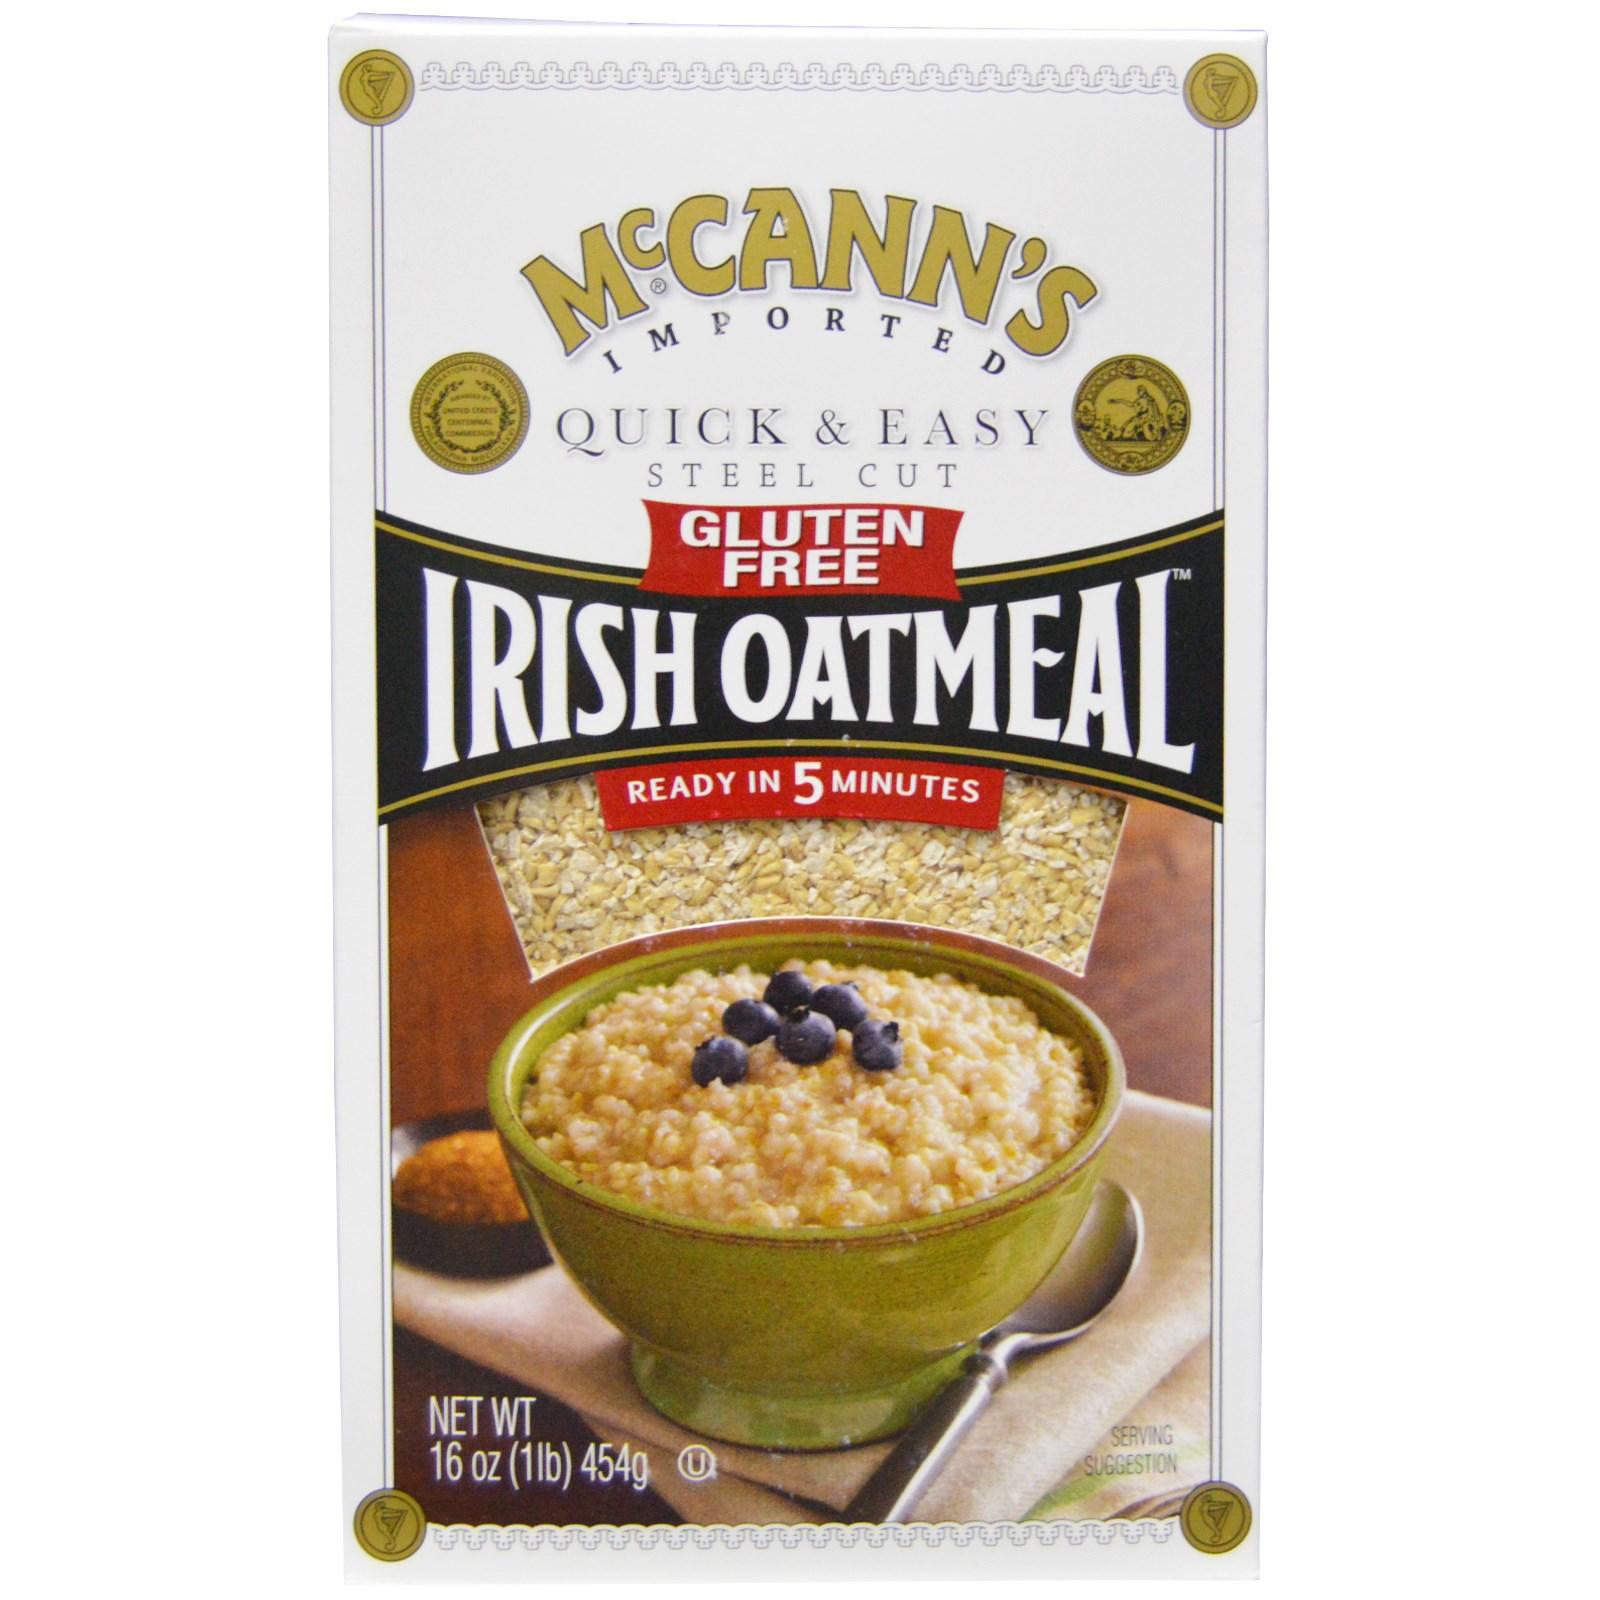 "McCann's Irish Oatmeal, ""Стил Кат"", ирландская овсянка, быстро и легко, без глютена, 16 унций (454 г)"